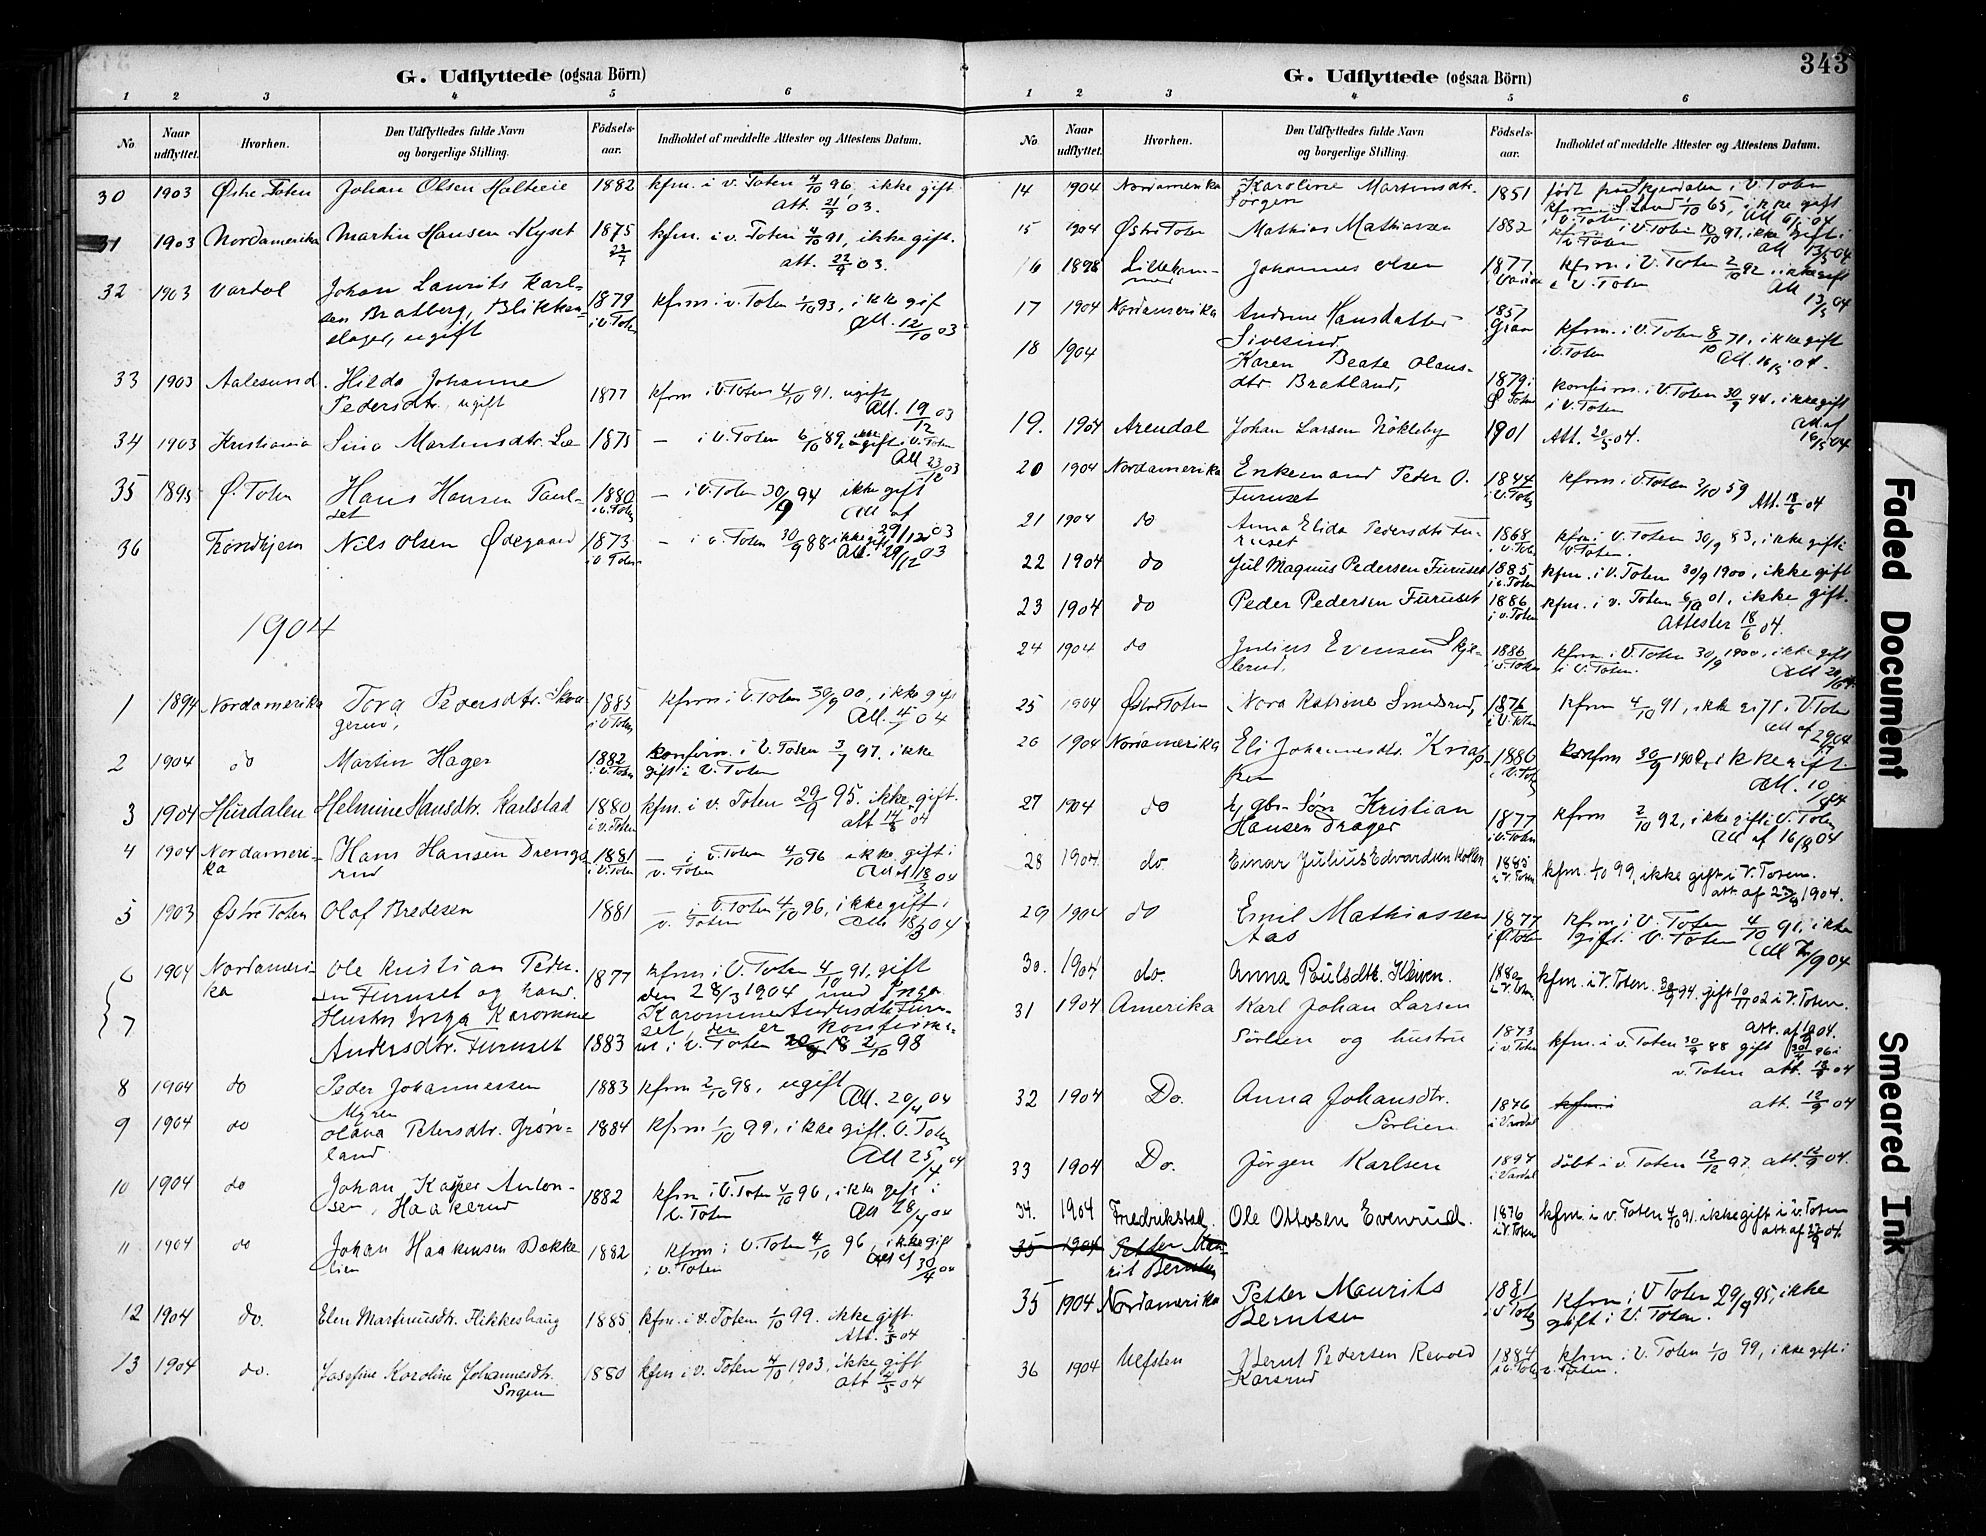 SAH, Vestre Toten prestekontor, H/Ha/Haa/L0011: Parish register (official) no. 11, 1895-1906, p. 343